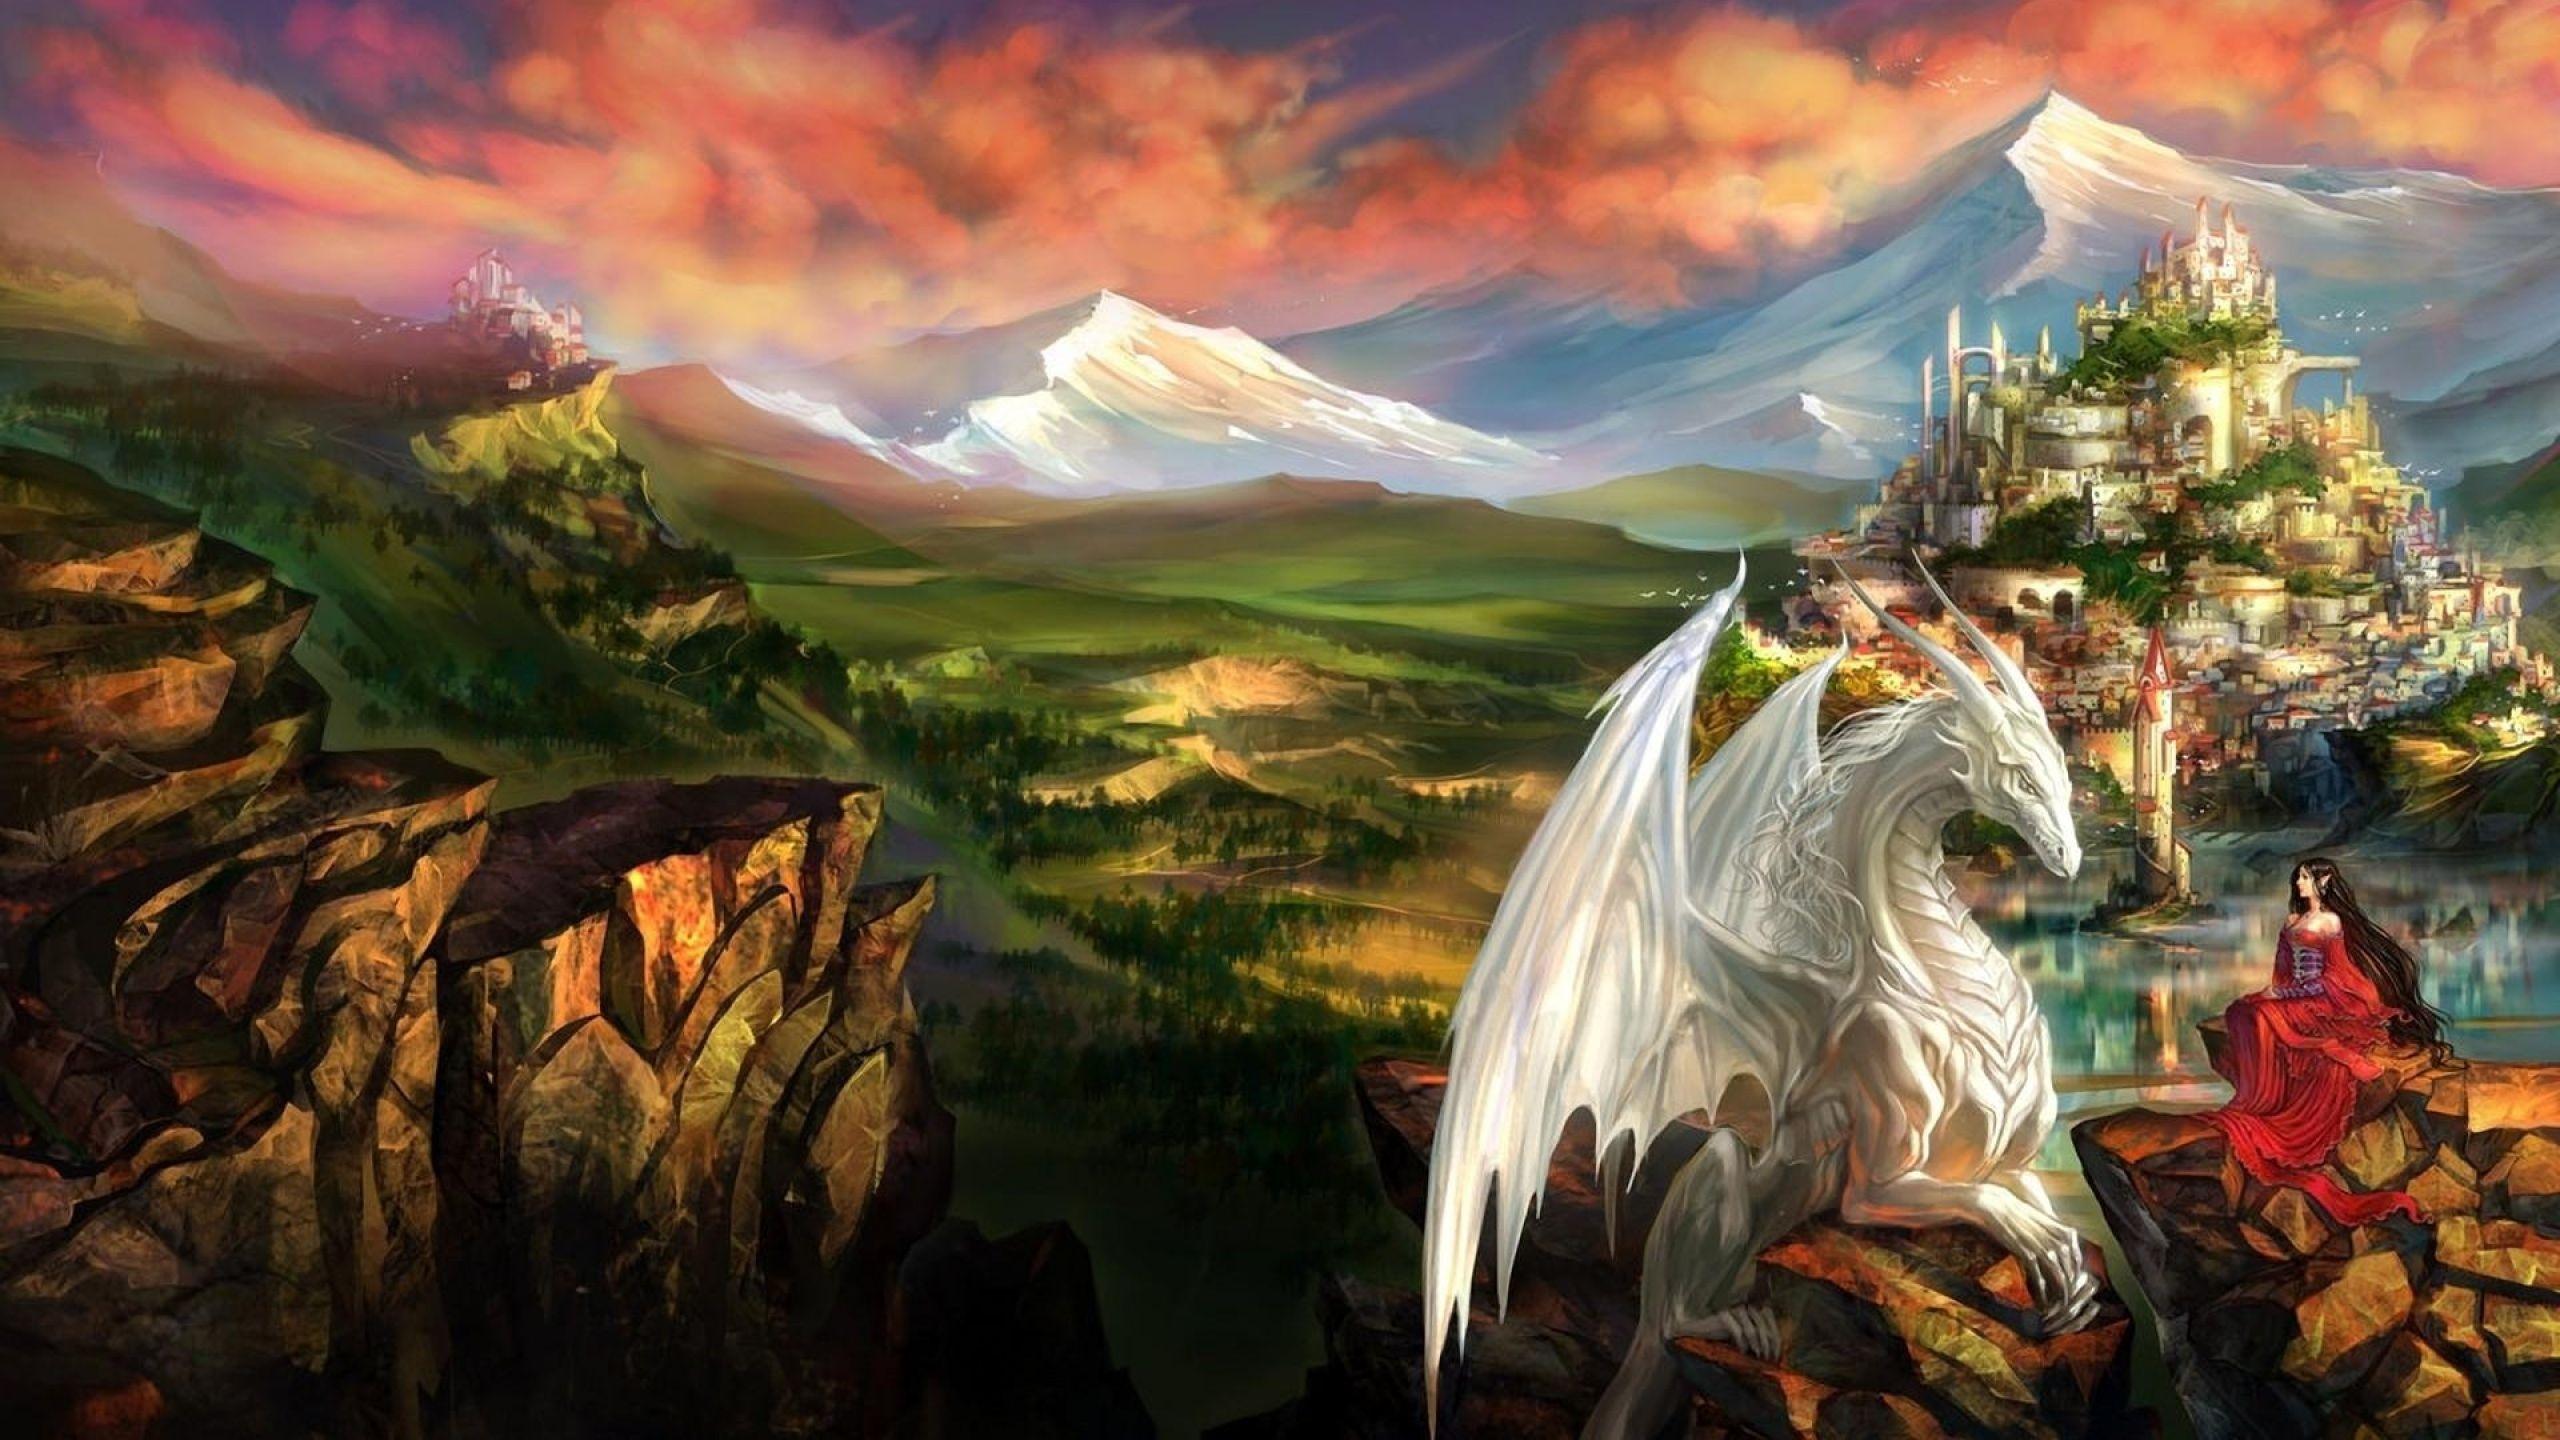 dragon-high-quality-and-resolution-wallpapers-on-evil-dragon ...